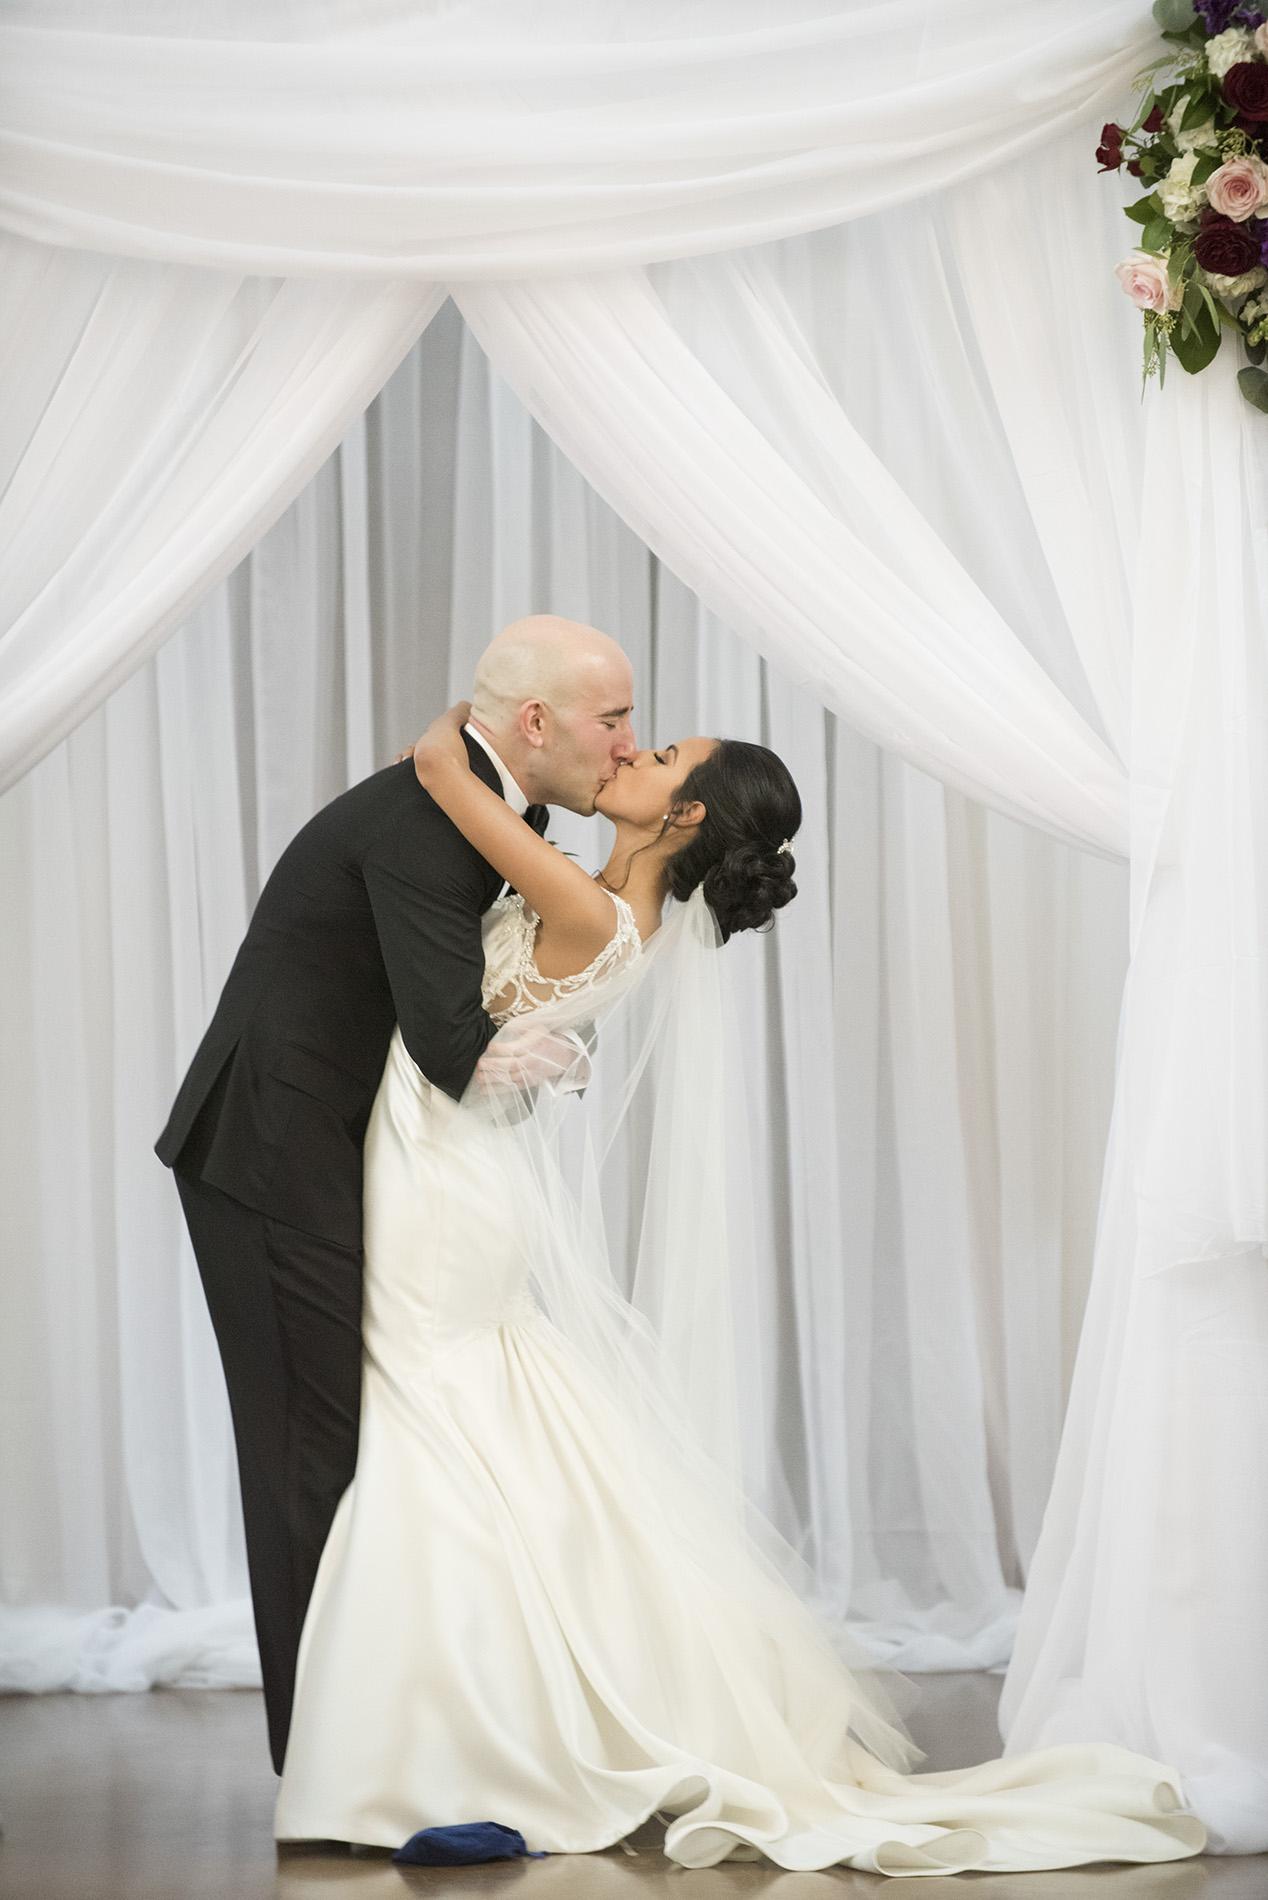 Houston-venue-Olde-Dobbin-Station-Romantic-Classic-Wedding-Photographer-064.jpg